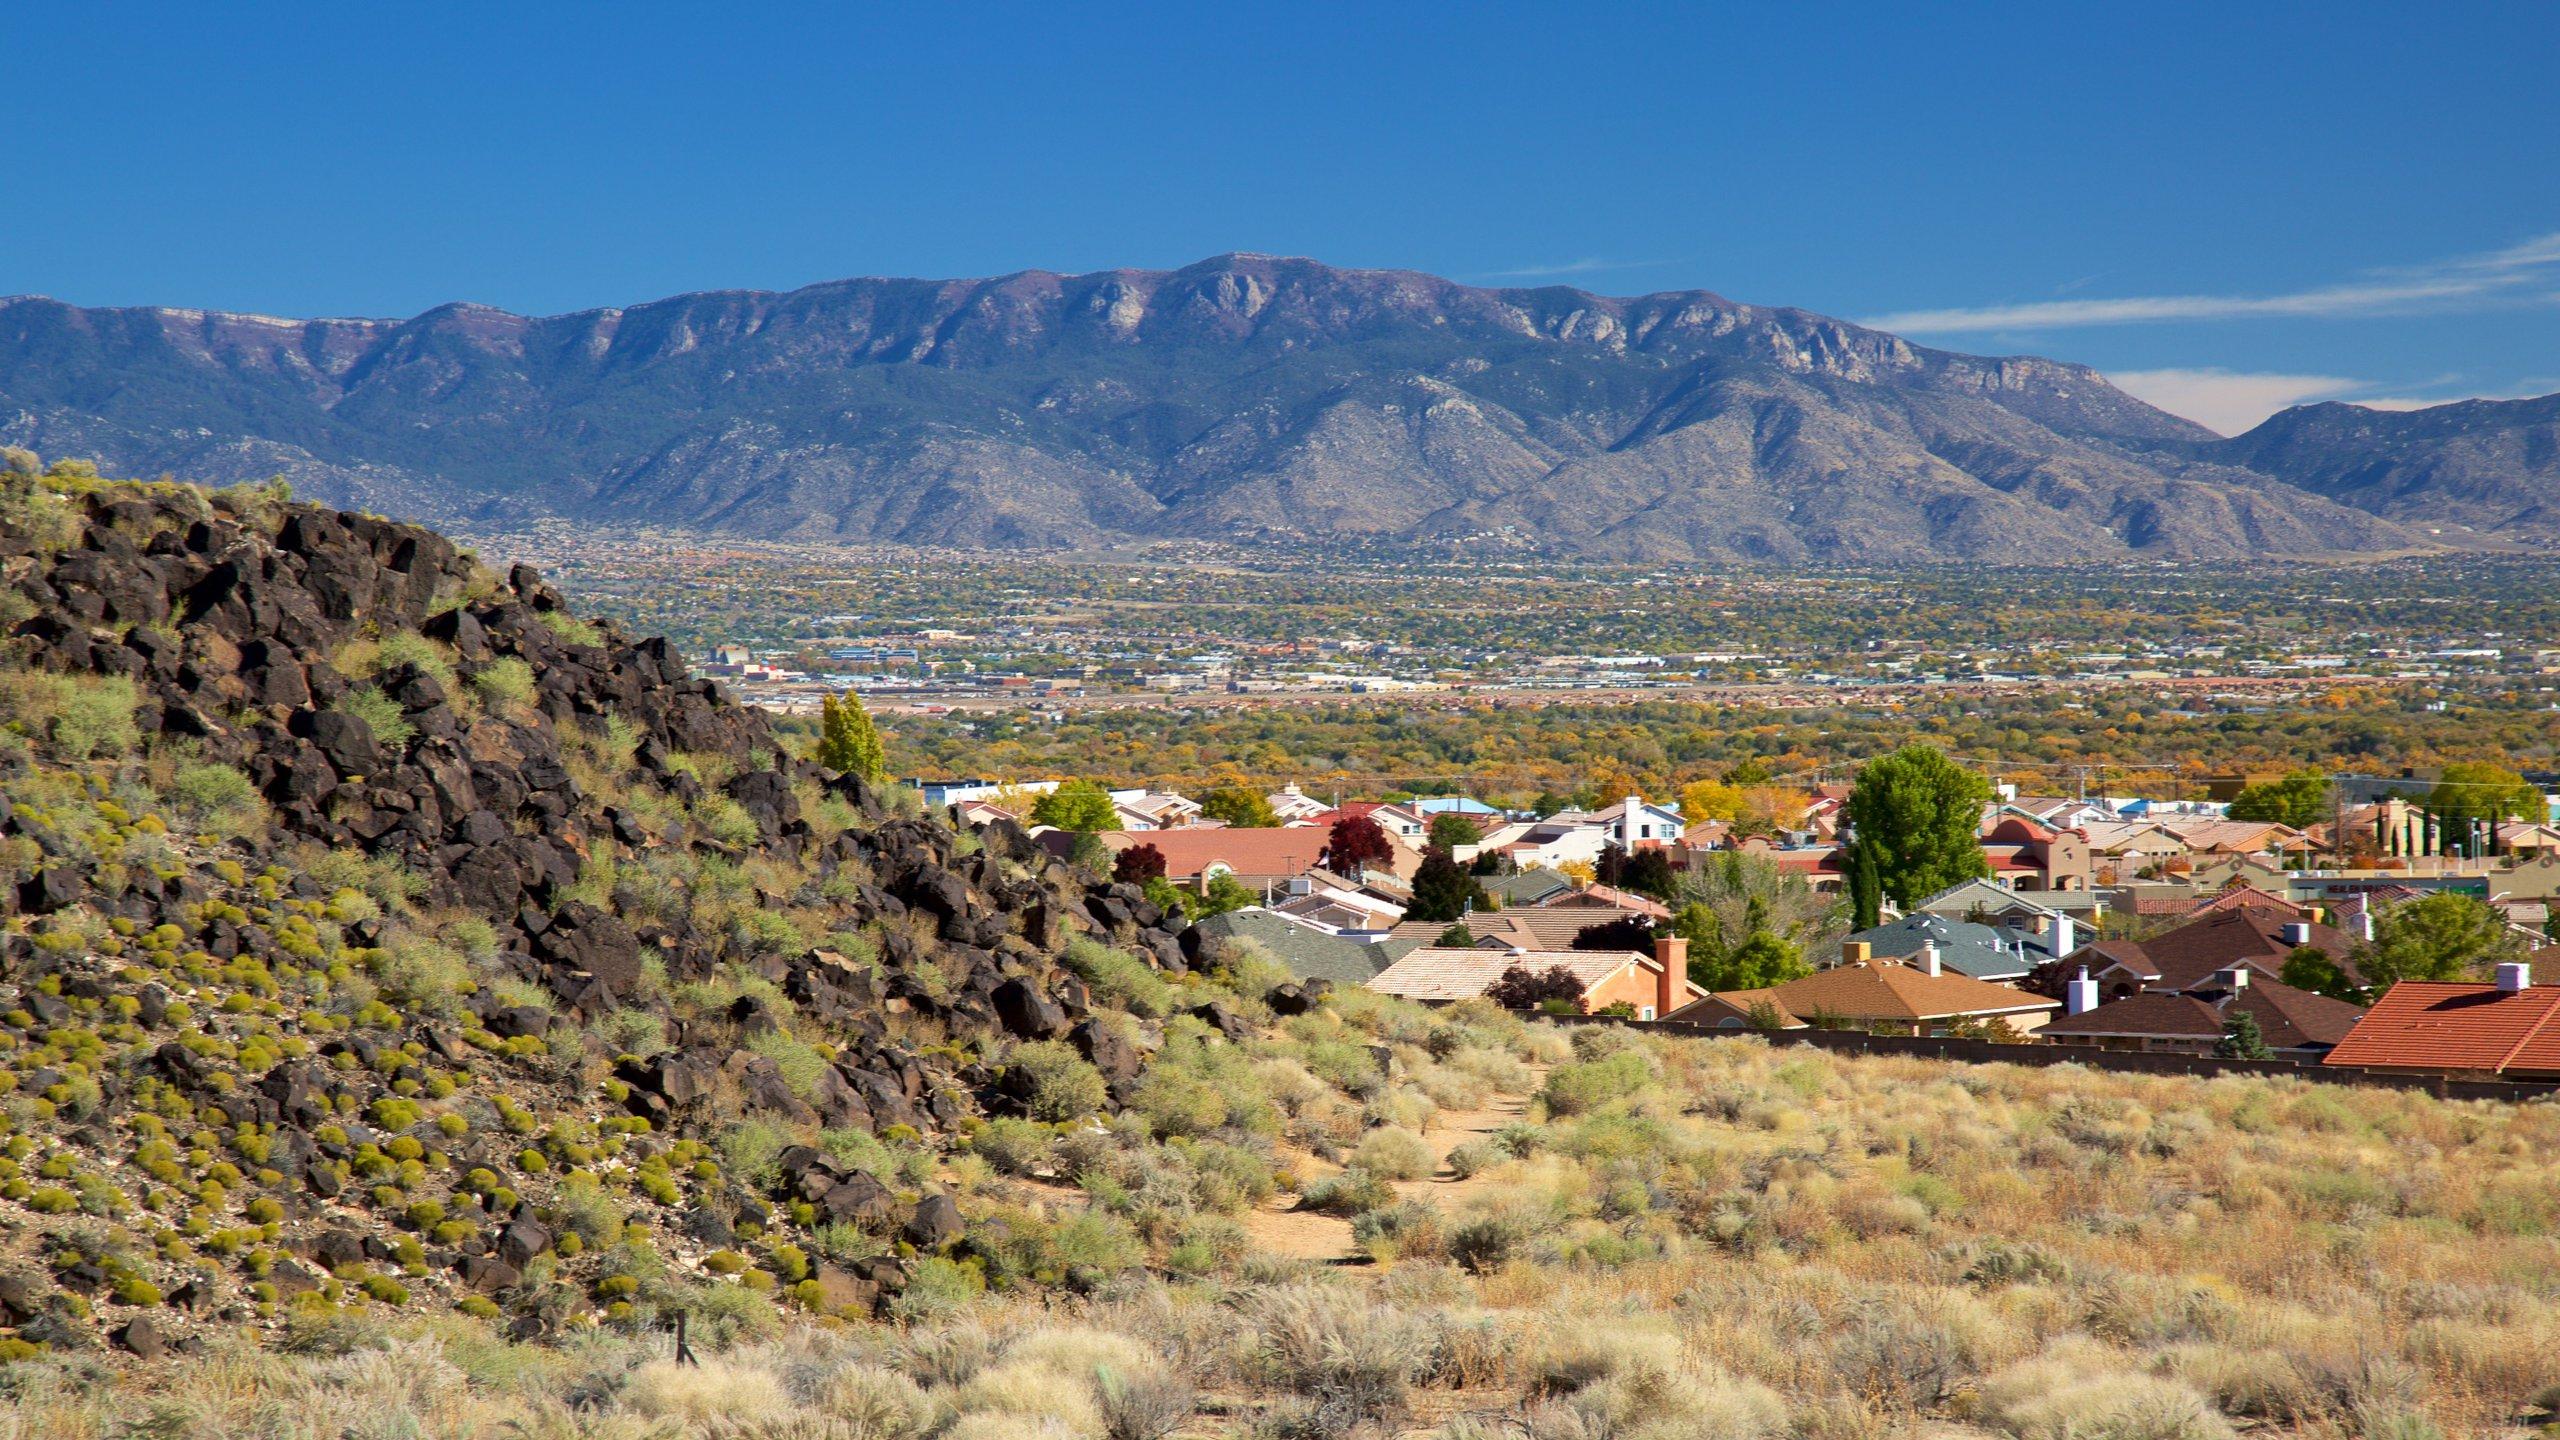 Westside, Albuquerque, New Mexico, Verenigde Staten